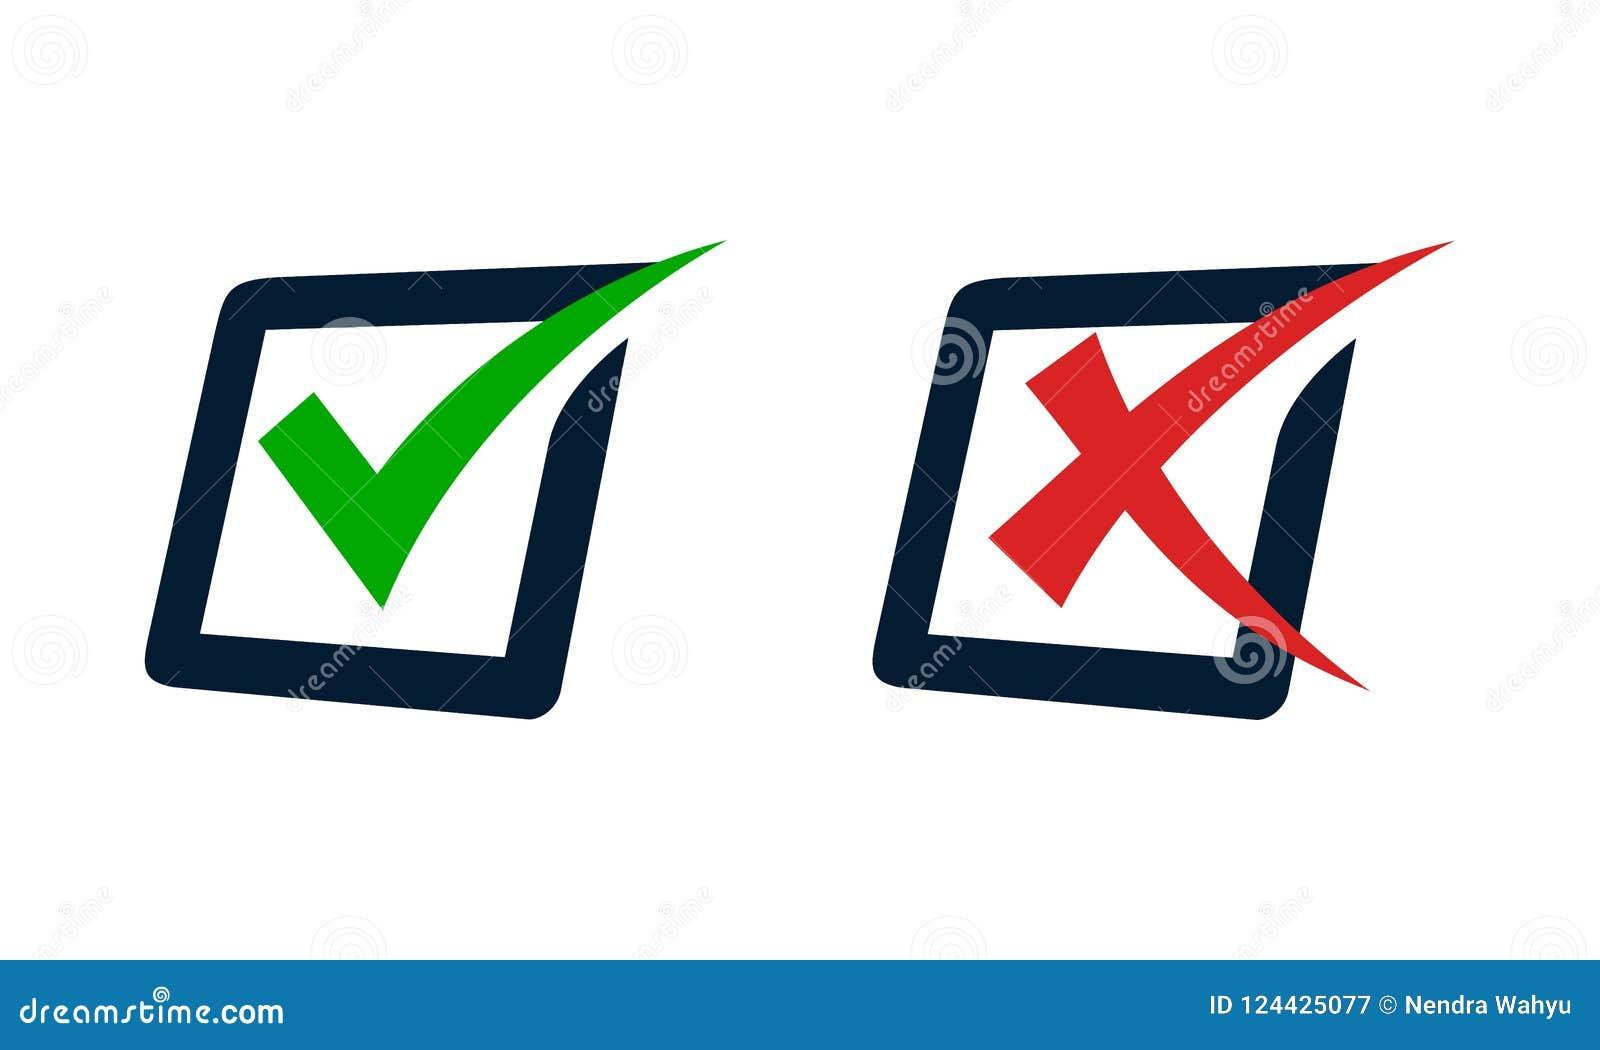 Check Mark And Cross Mark On A Survey Box Stock Vector